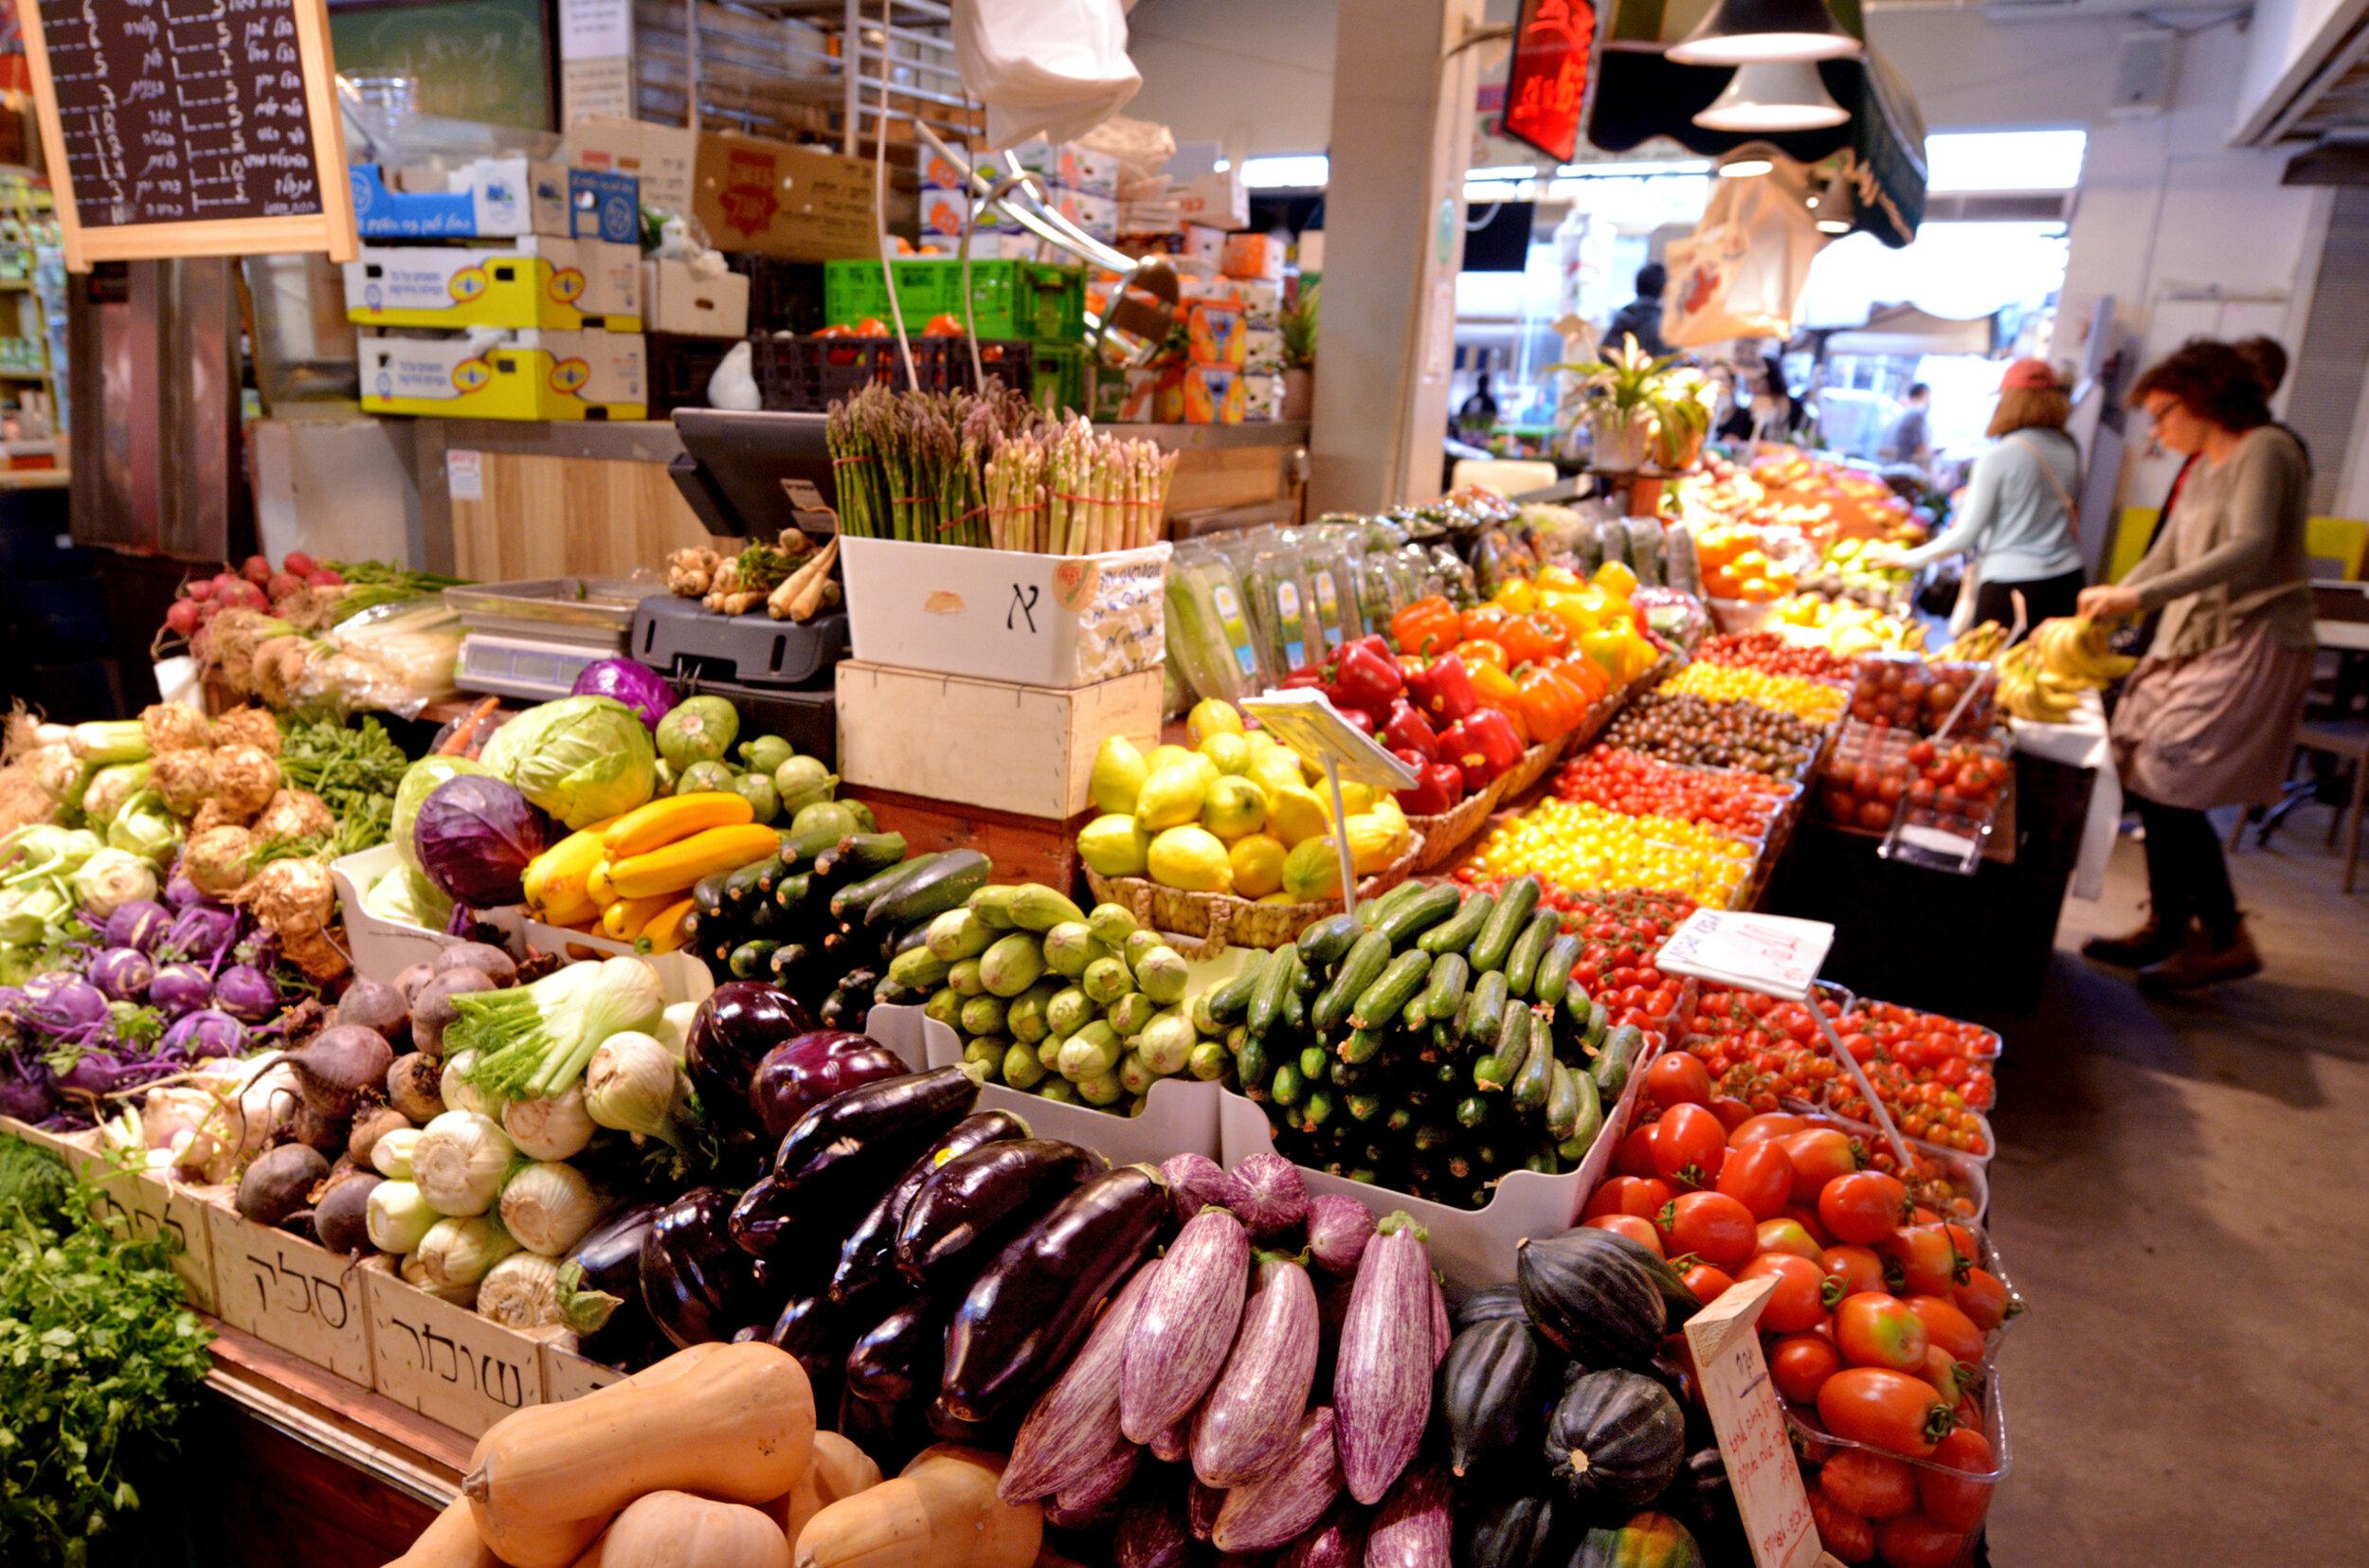 Local produce at Shuk Hanamal in Tel Aviv.